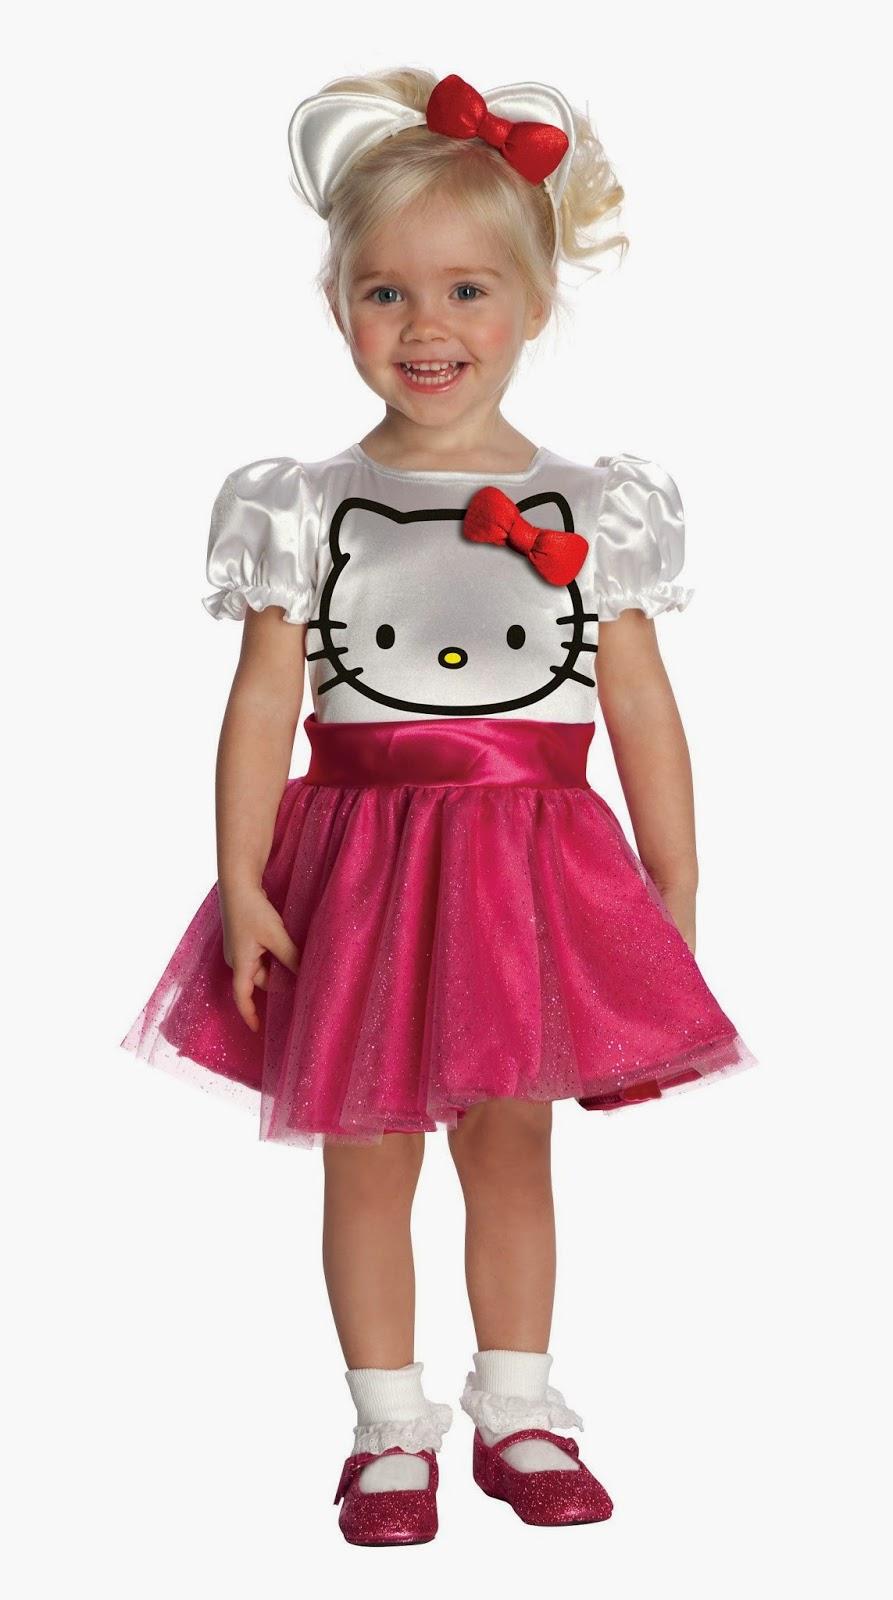 Foto Baju Anak Hello Kitty Cewek Cantik Imut Lucu